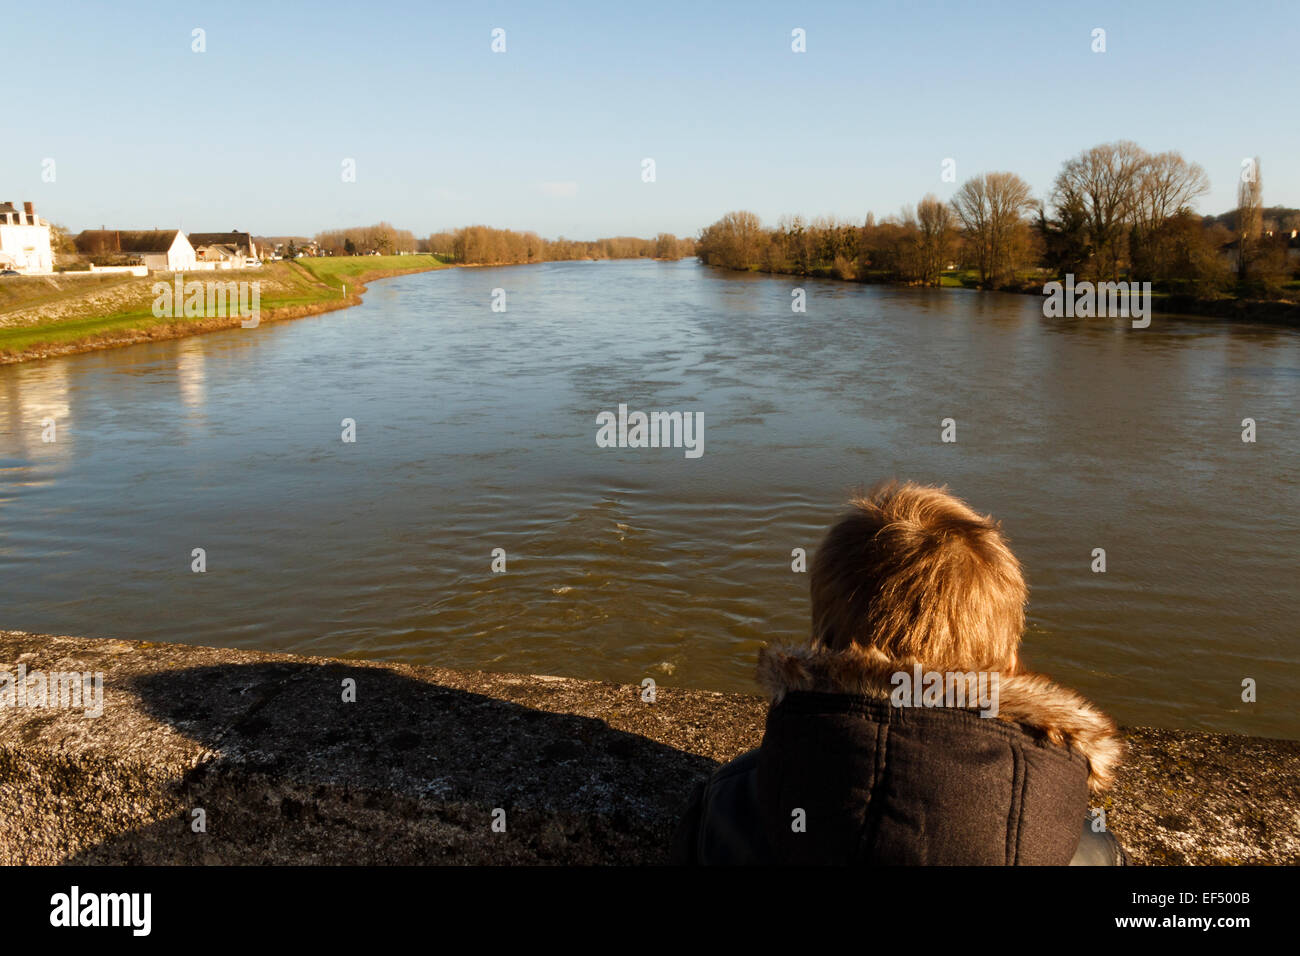 Joven afuera mirando el agua, río Loira, Francia. Imagen De Stock